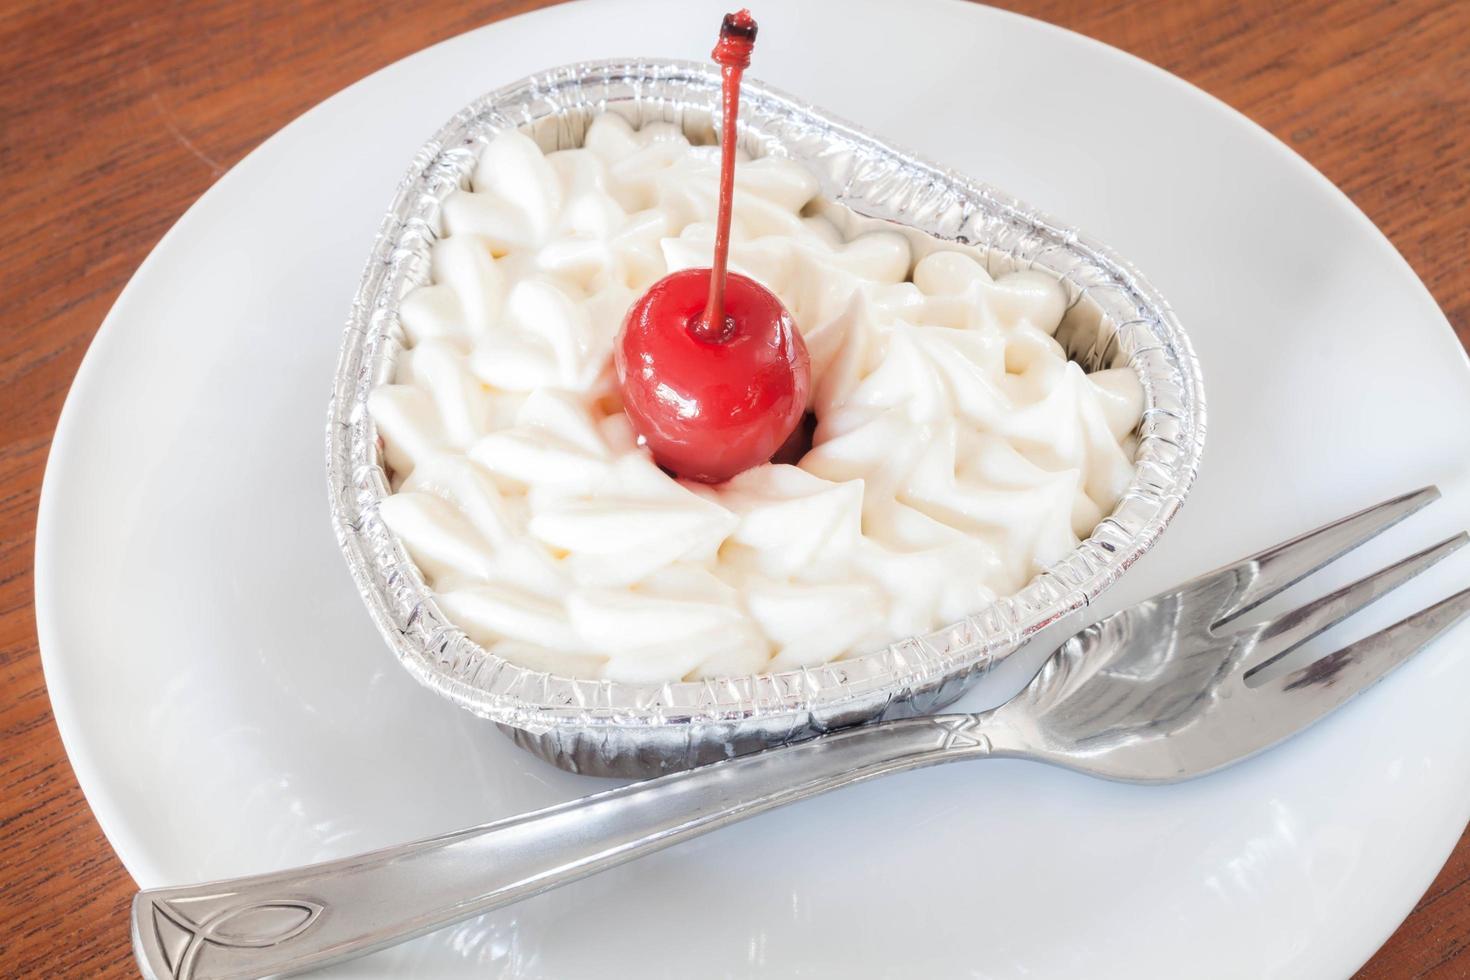 cheesecake avec garniture aux cerises photo